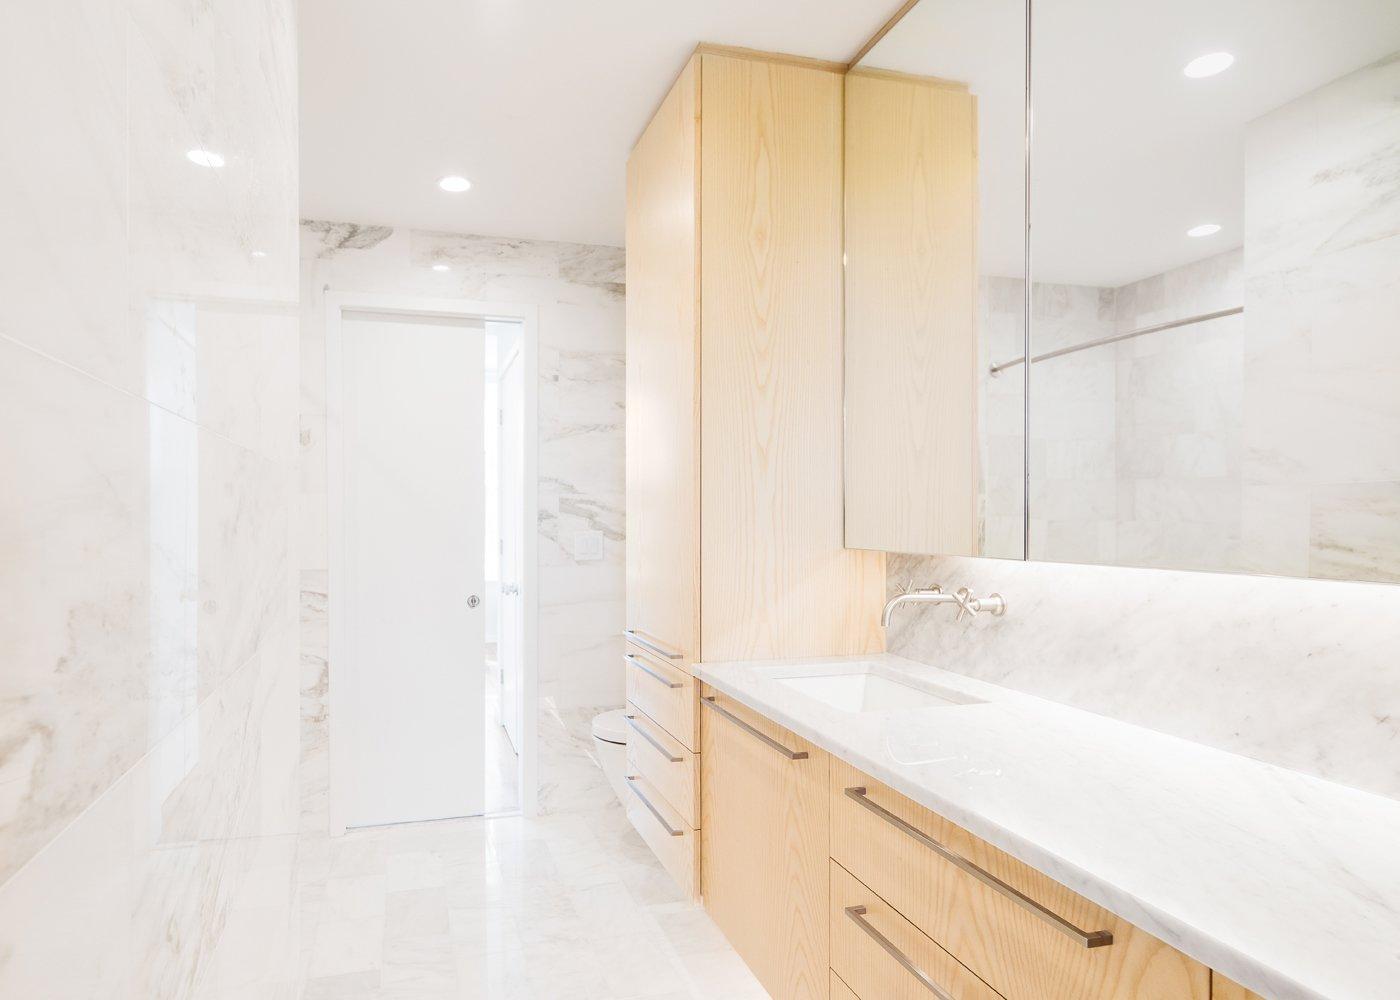 Bath Room and Marble Counter  Wayne Street Row House by Jeff Jordan Architects